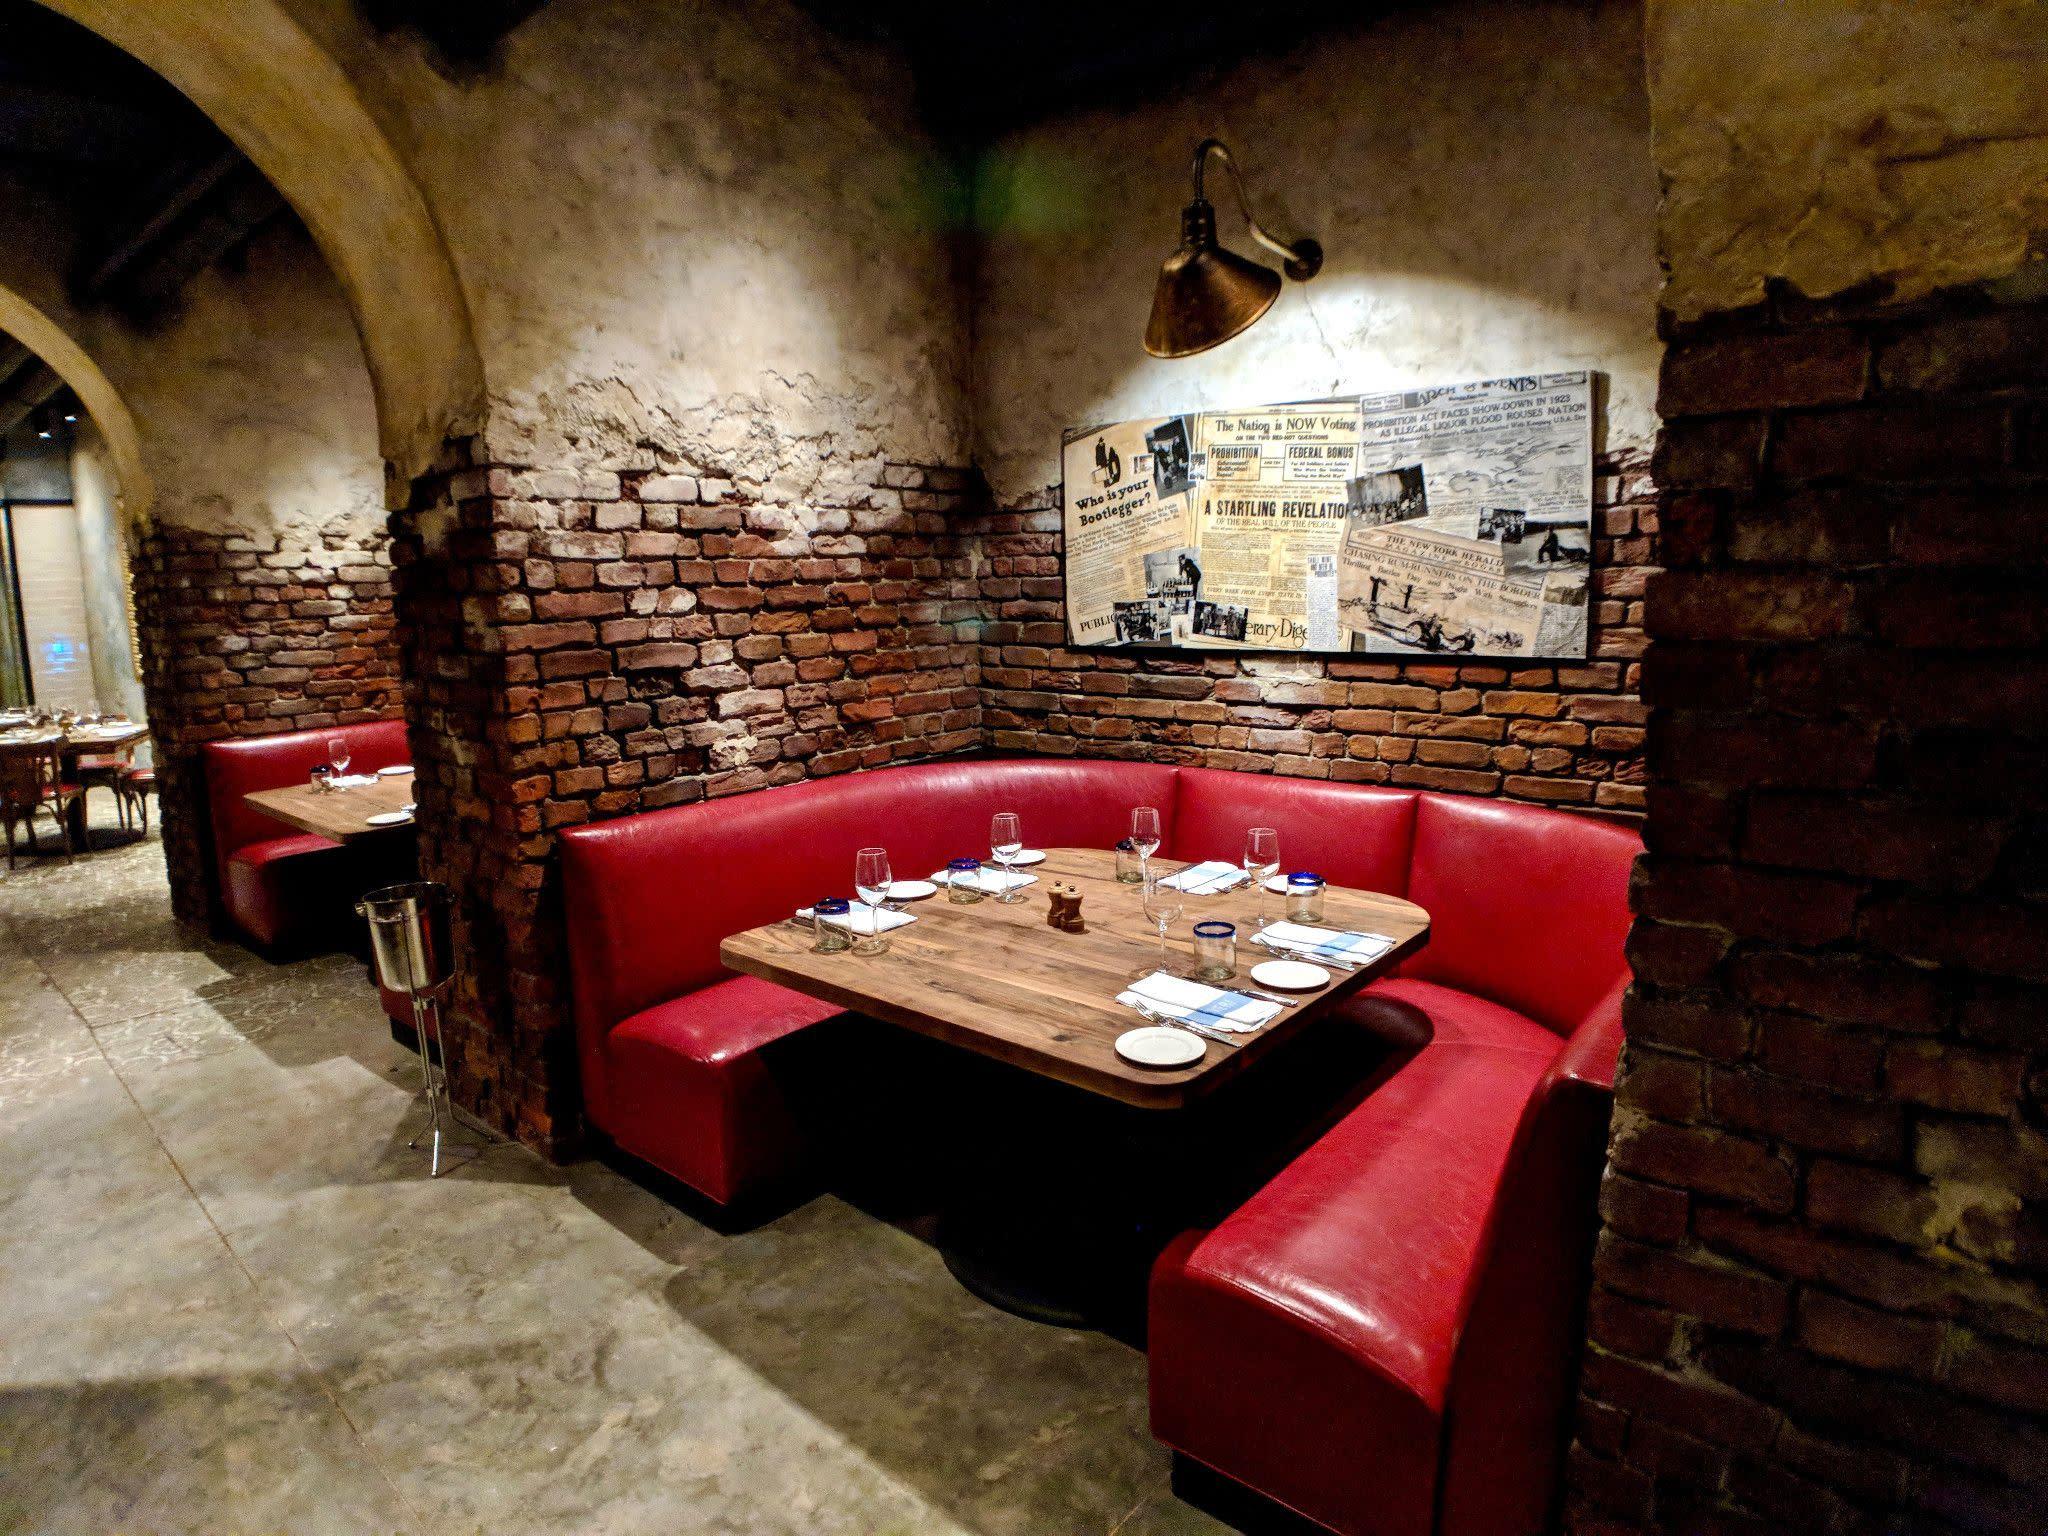 Enzo's Hideaway Tunnel Bar & Restaurant in Orlando